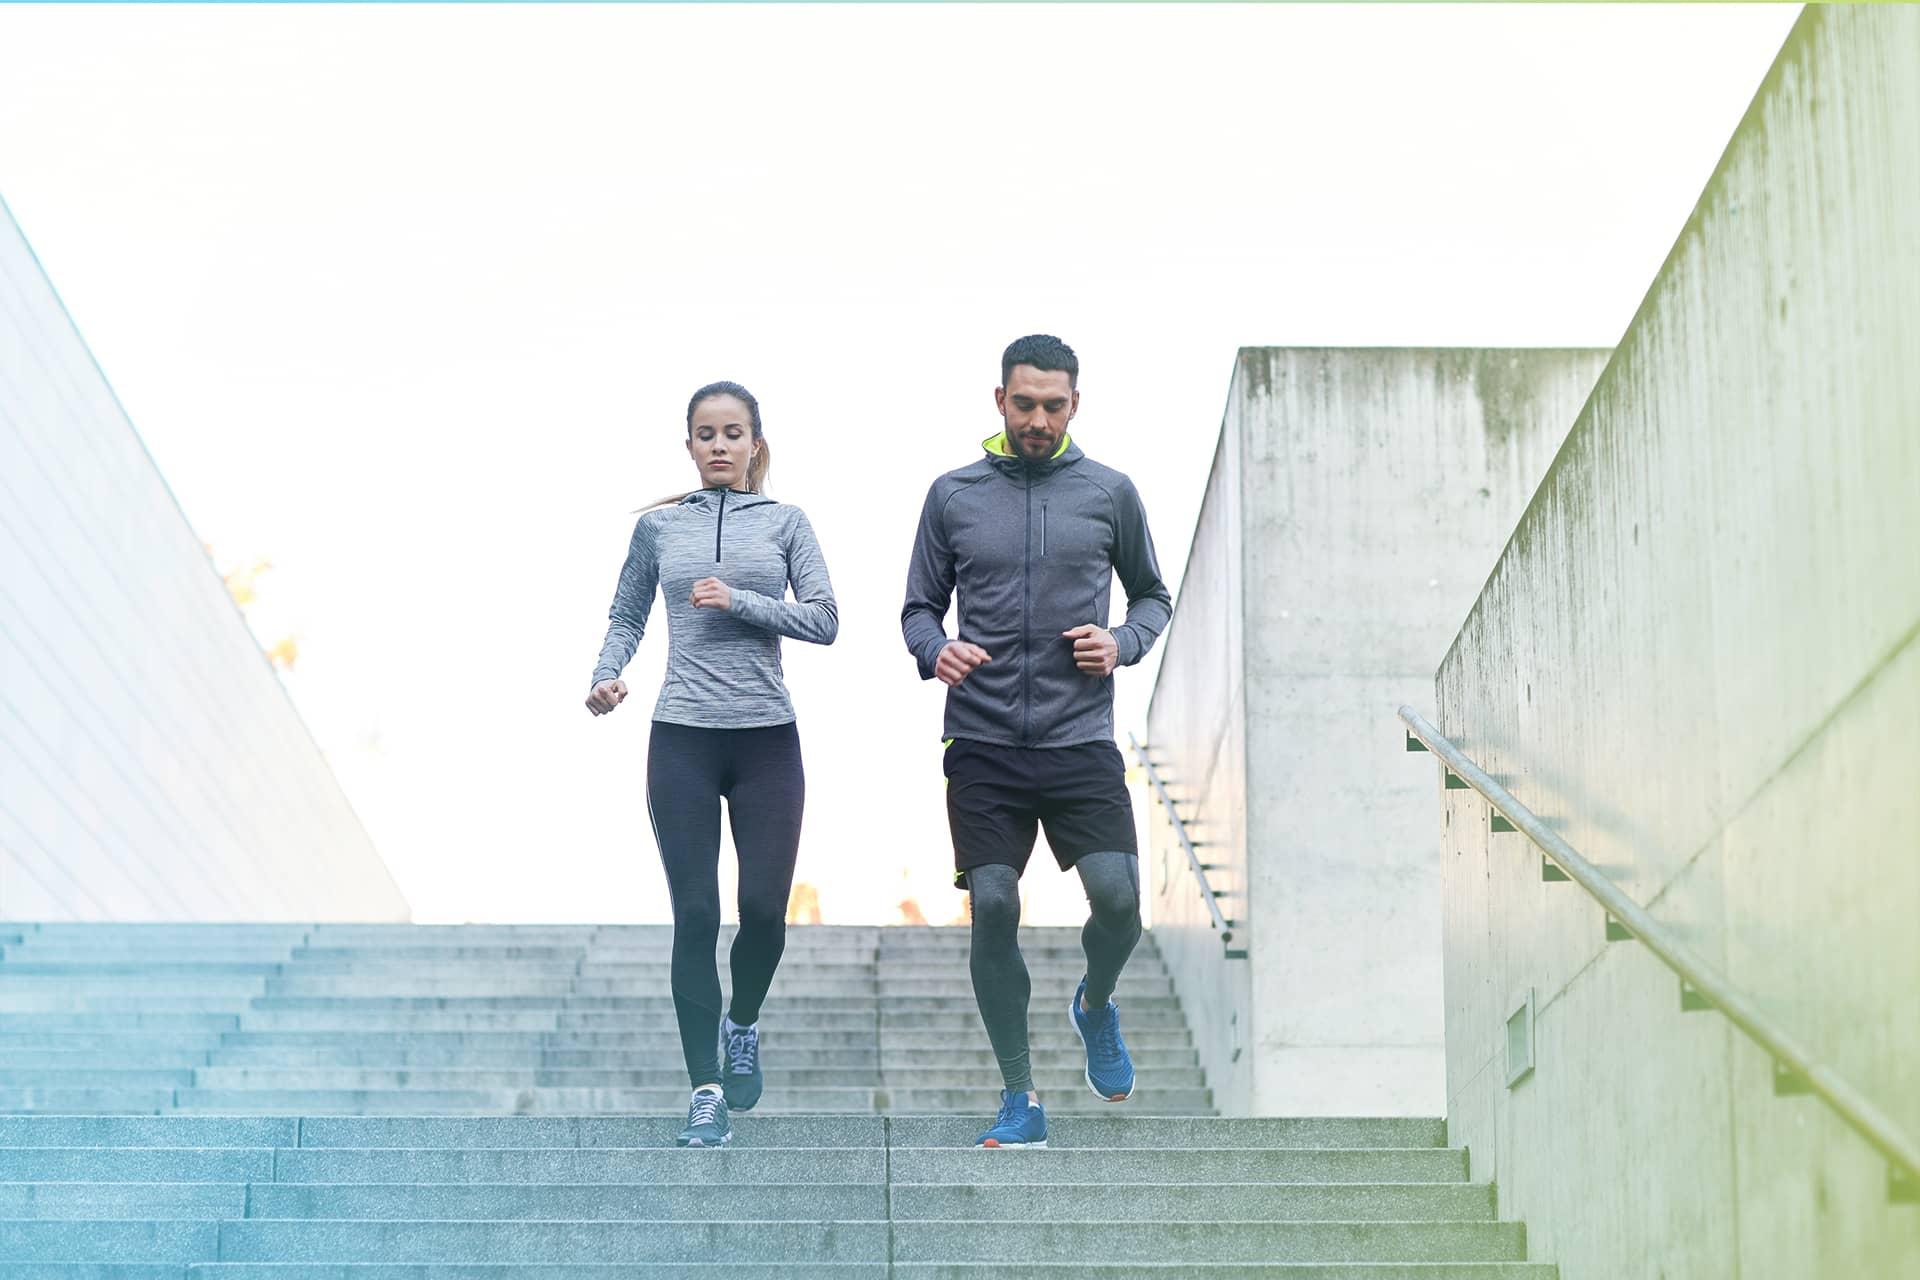 Outdoor Mann Frau Treppe Jogging Fitness